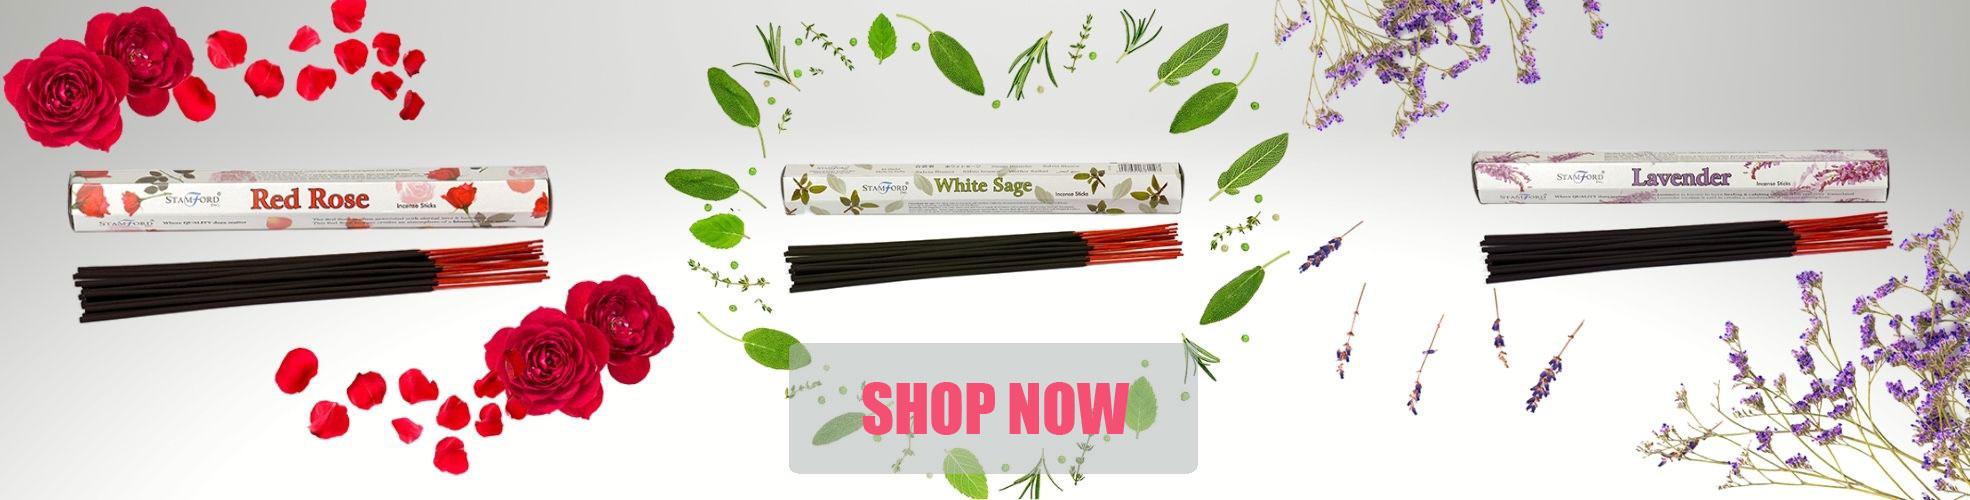 Wholesale Incense Sticks & Incense Cones